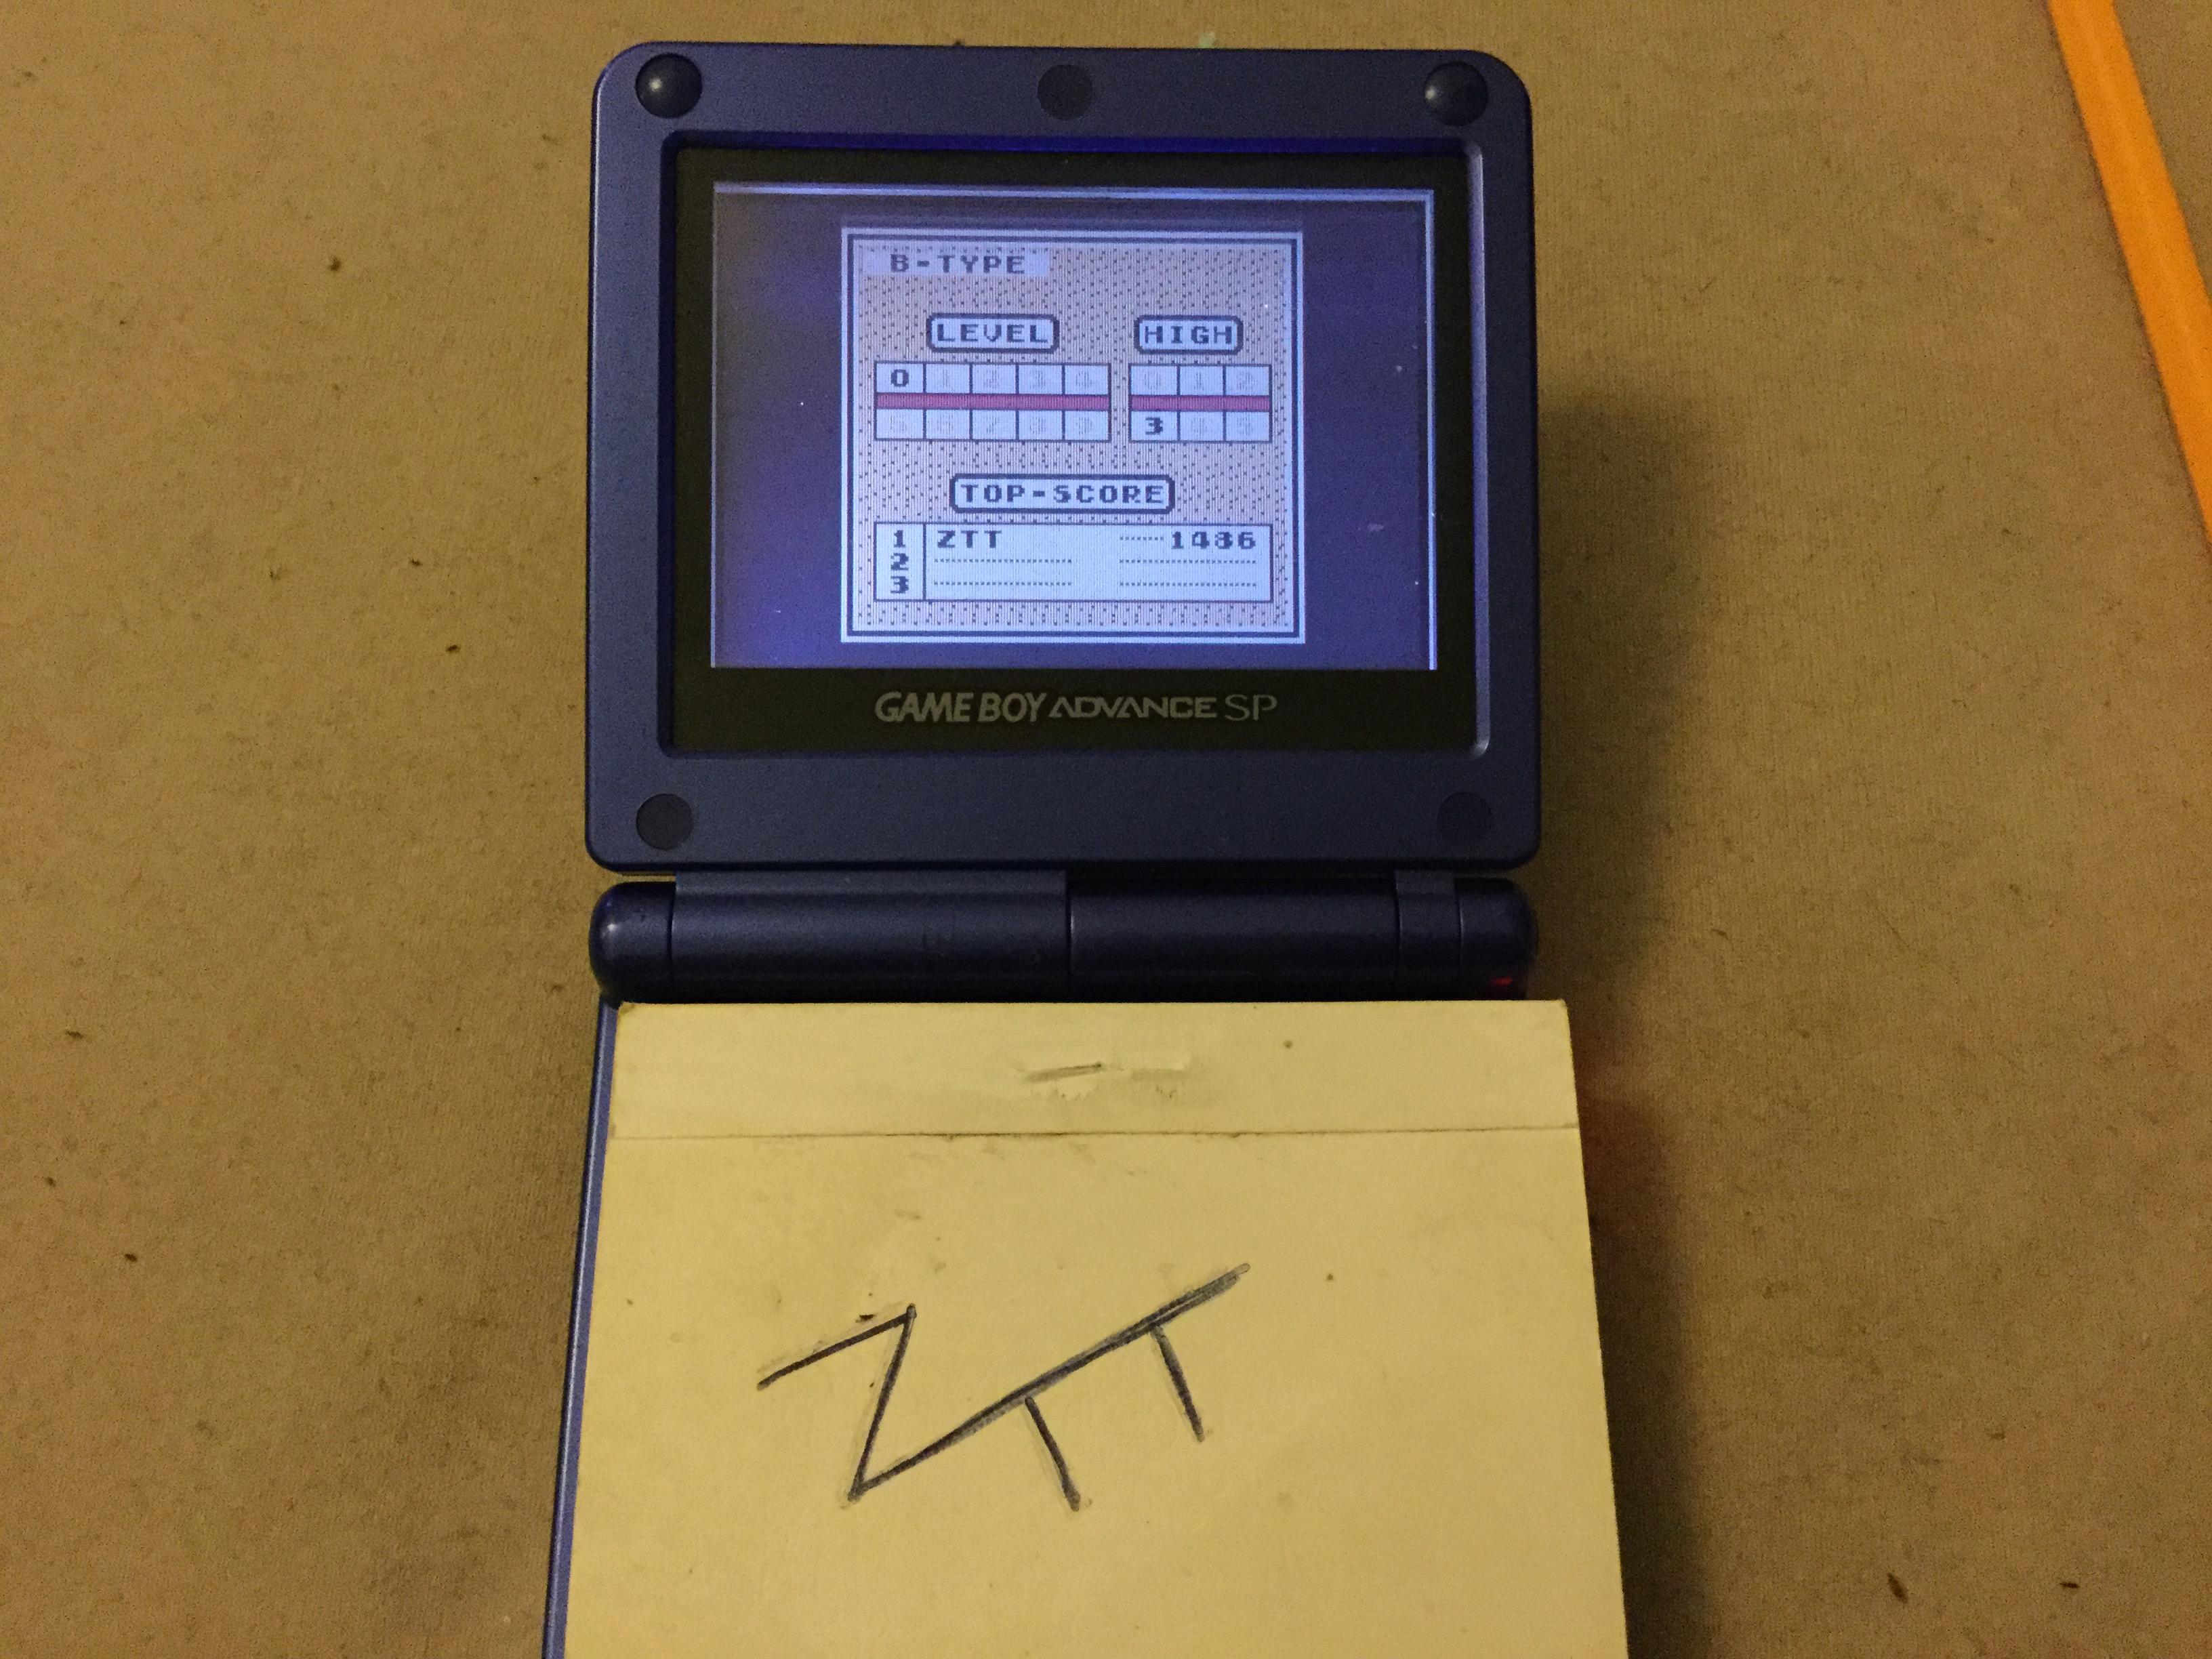 Frankie: Tetris: Type B [Level 0 / High 3] (Game Boy) 1,486 points on 2019-11-13 12:07:06